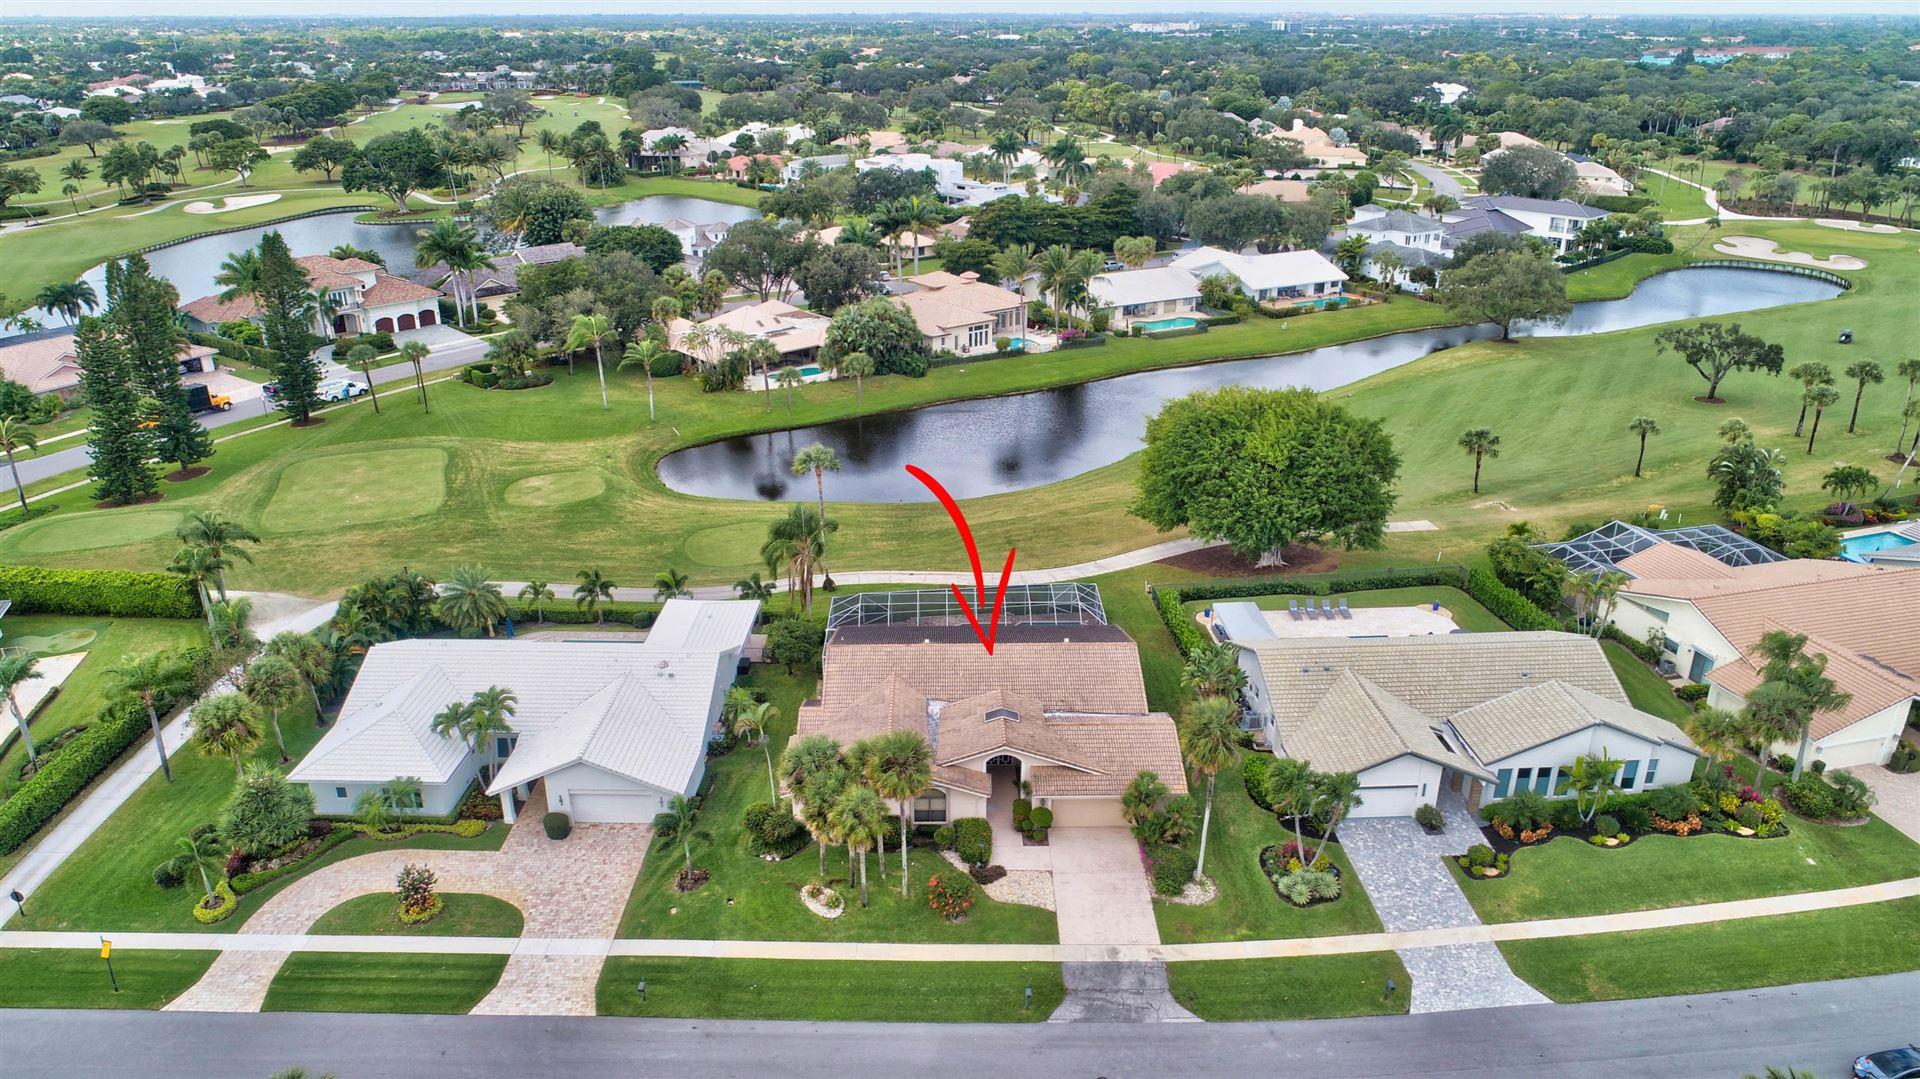 16695 Ironwood Drive, Delray Beach, FL 33445 - #: RX-10592017